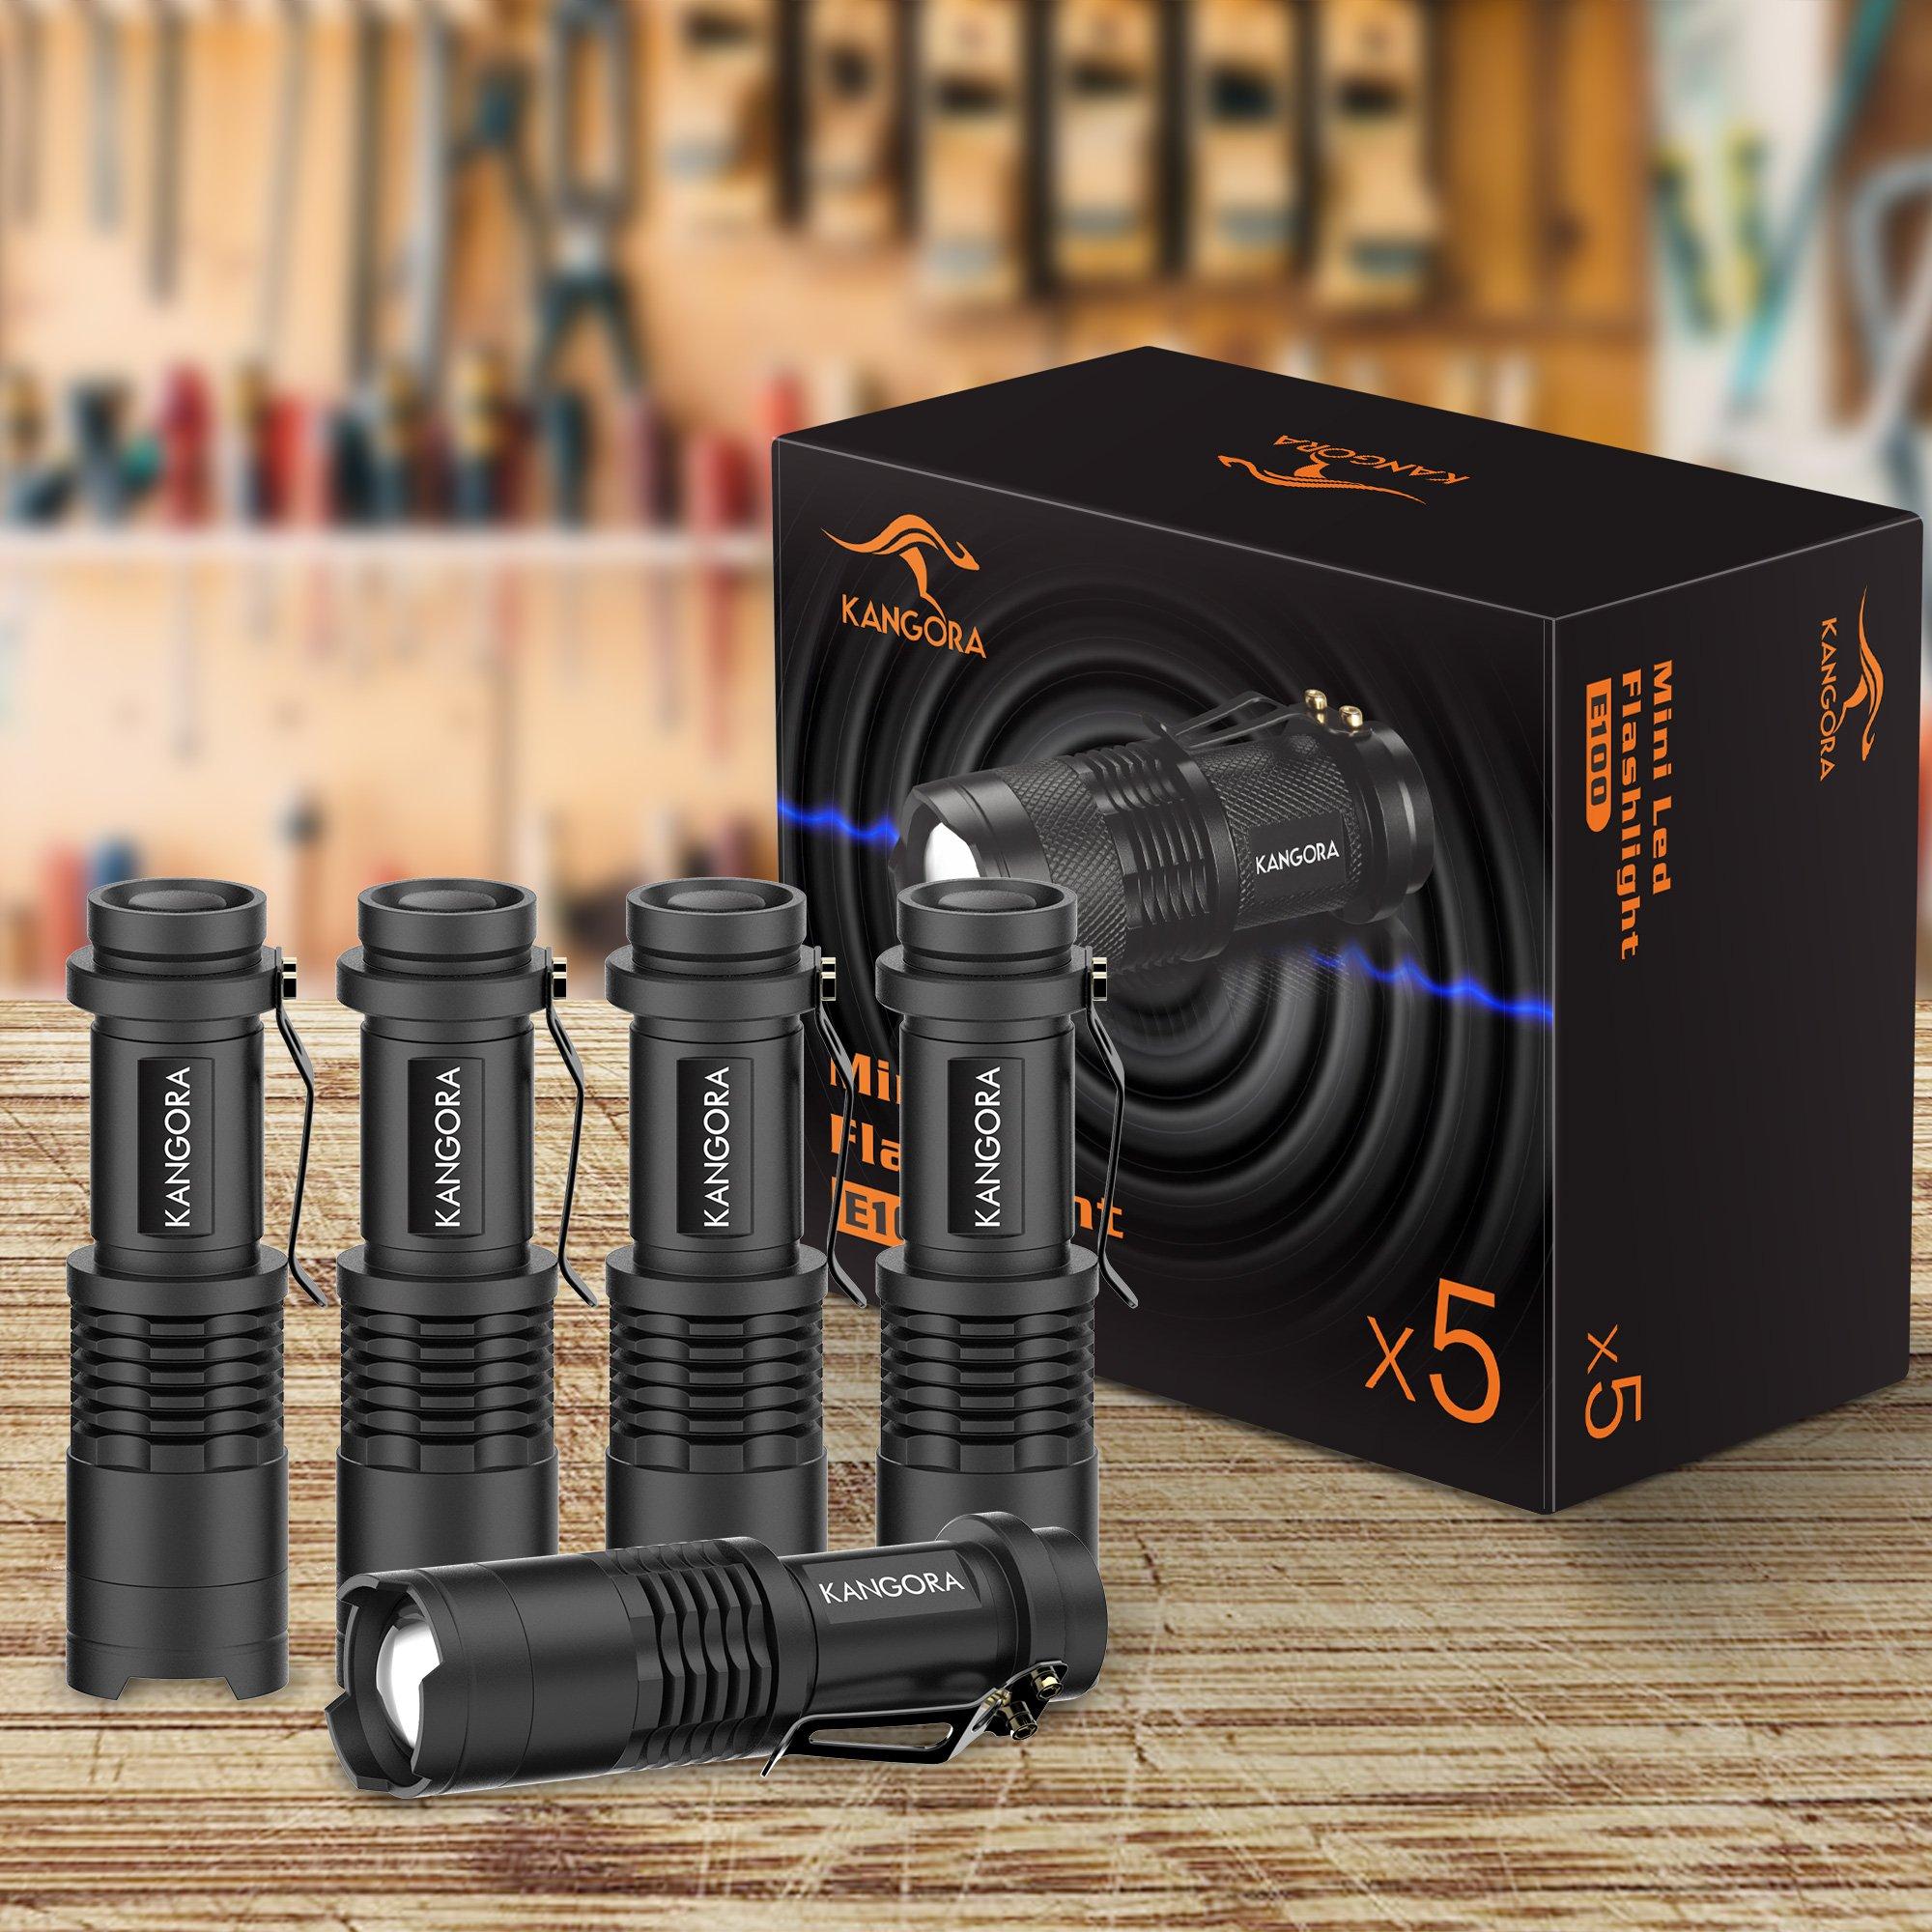 KANGORA Pack of 5, 300 Lumens LED Tactical Mini Handheld Flashlights 3 Light Modes by KANGORA (Image #3)